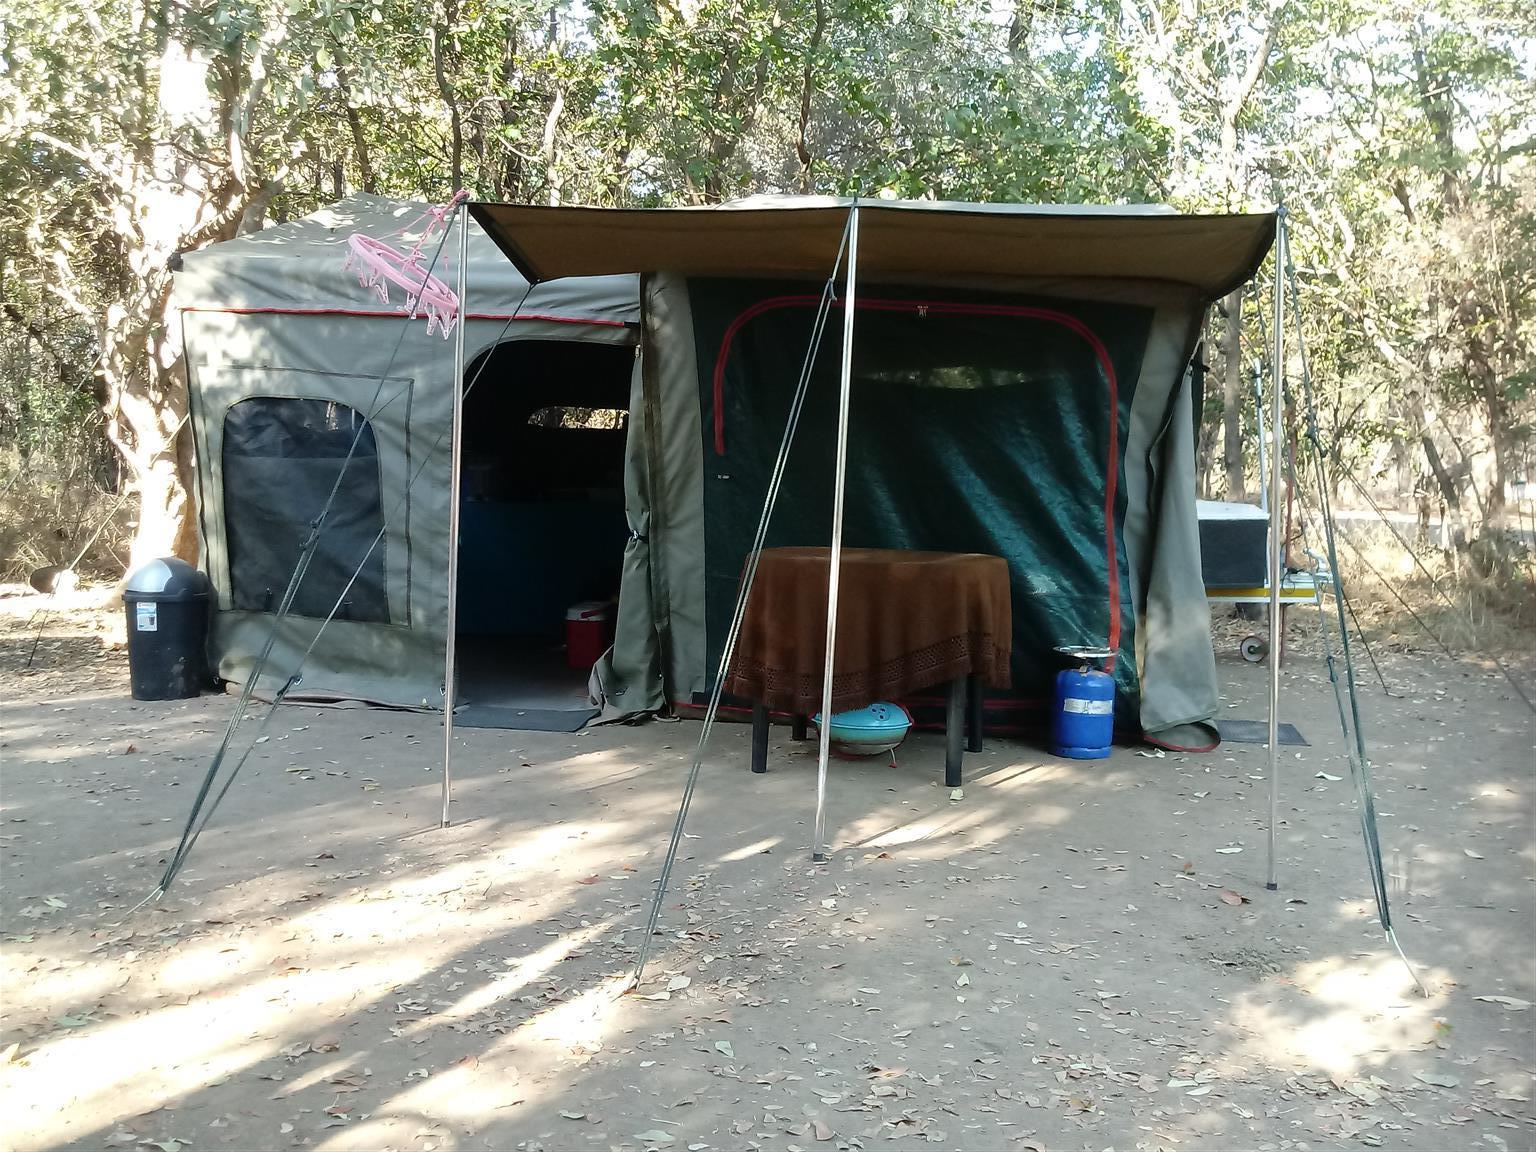 Venter Camper & Tent